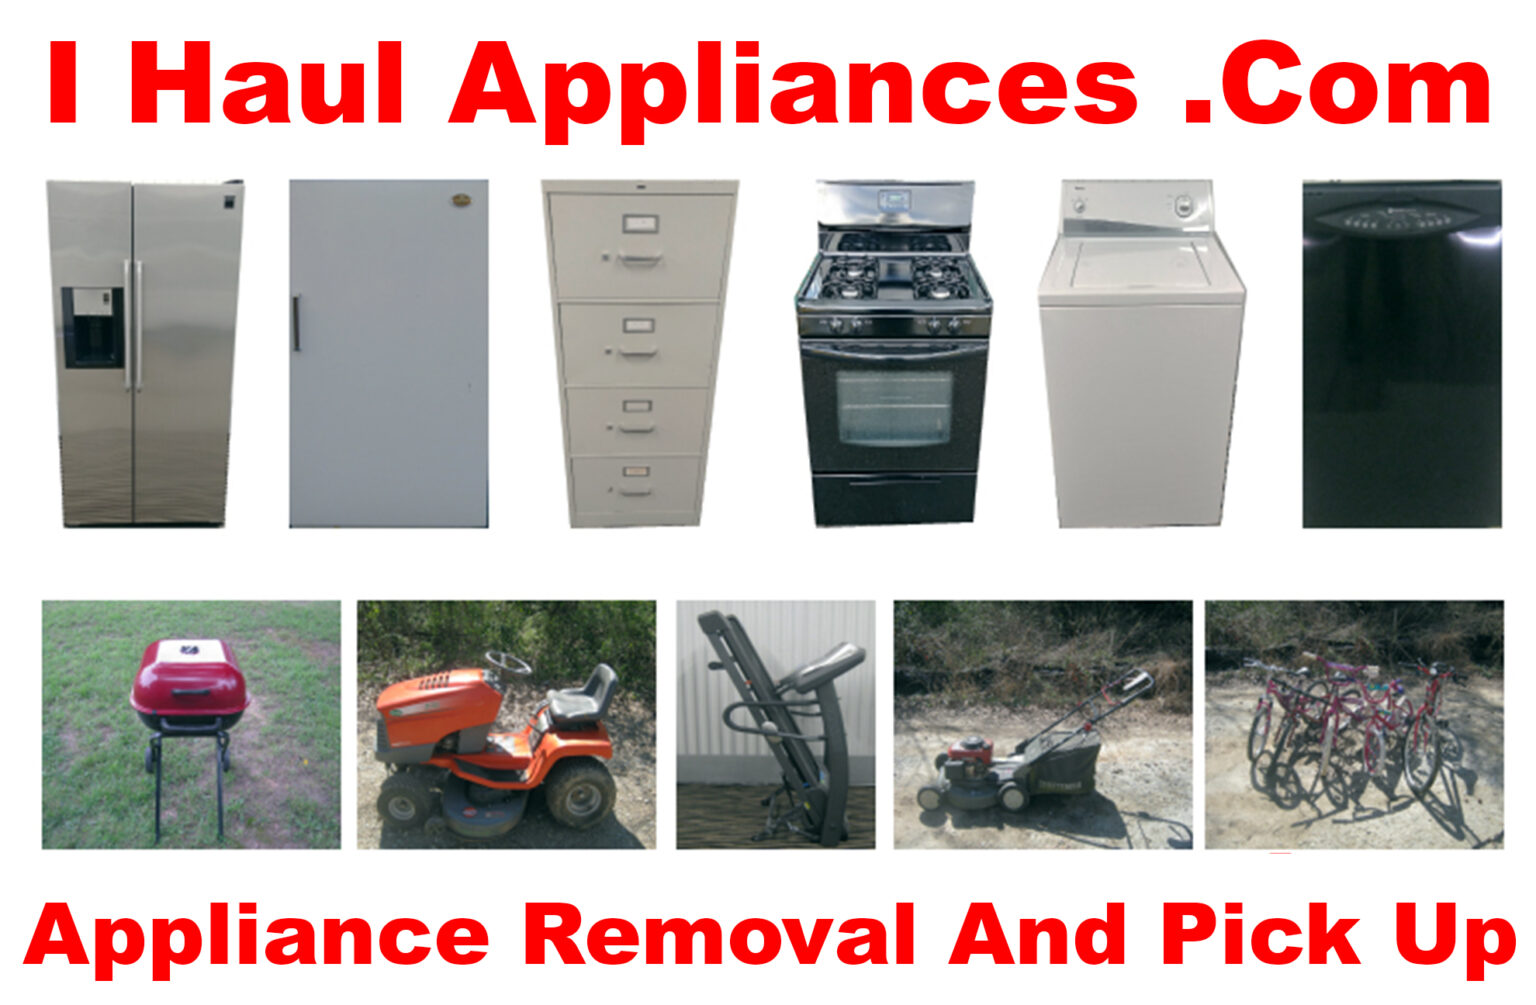 contact us 404-965-1963 i haul appliances